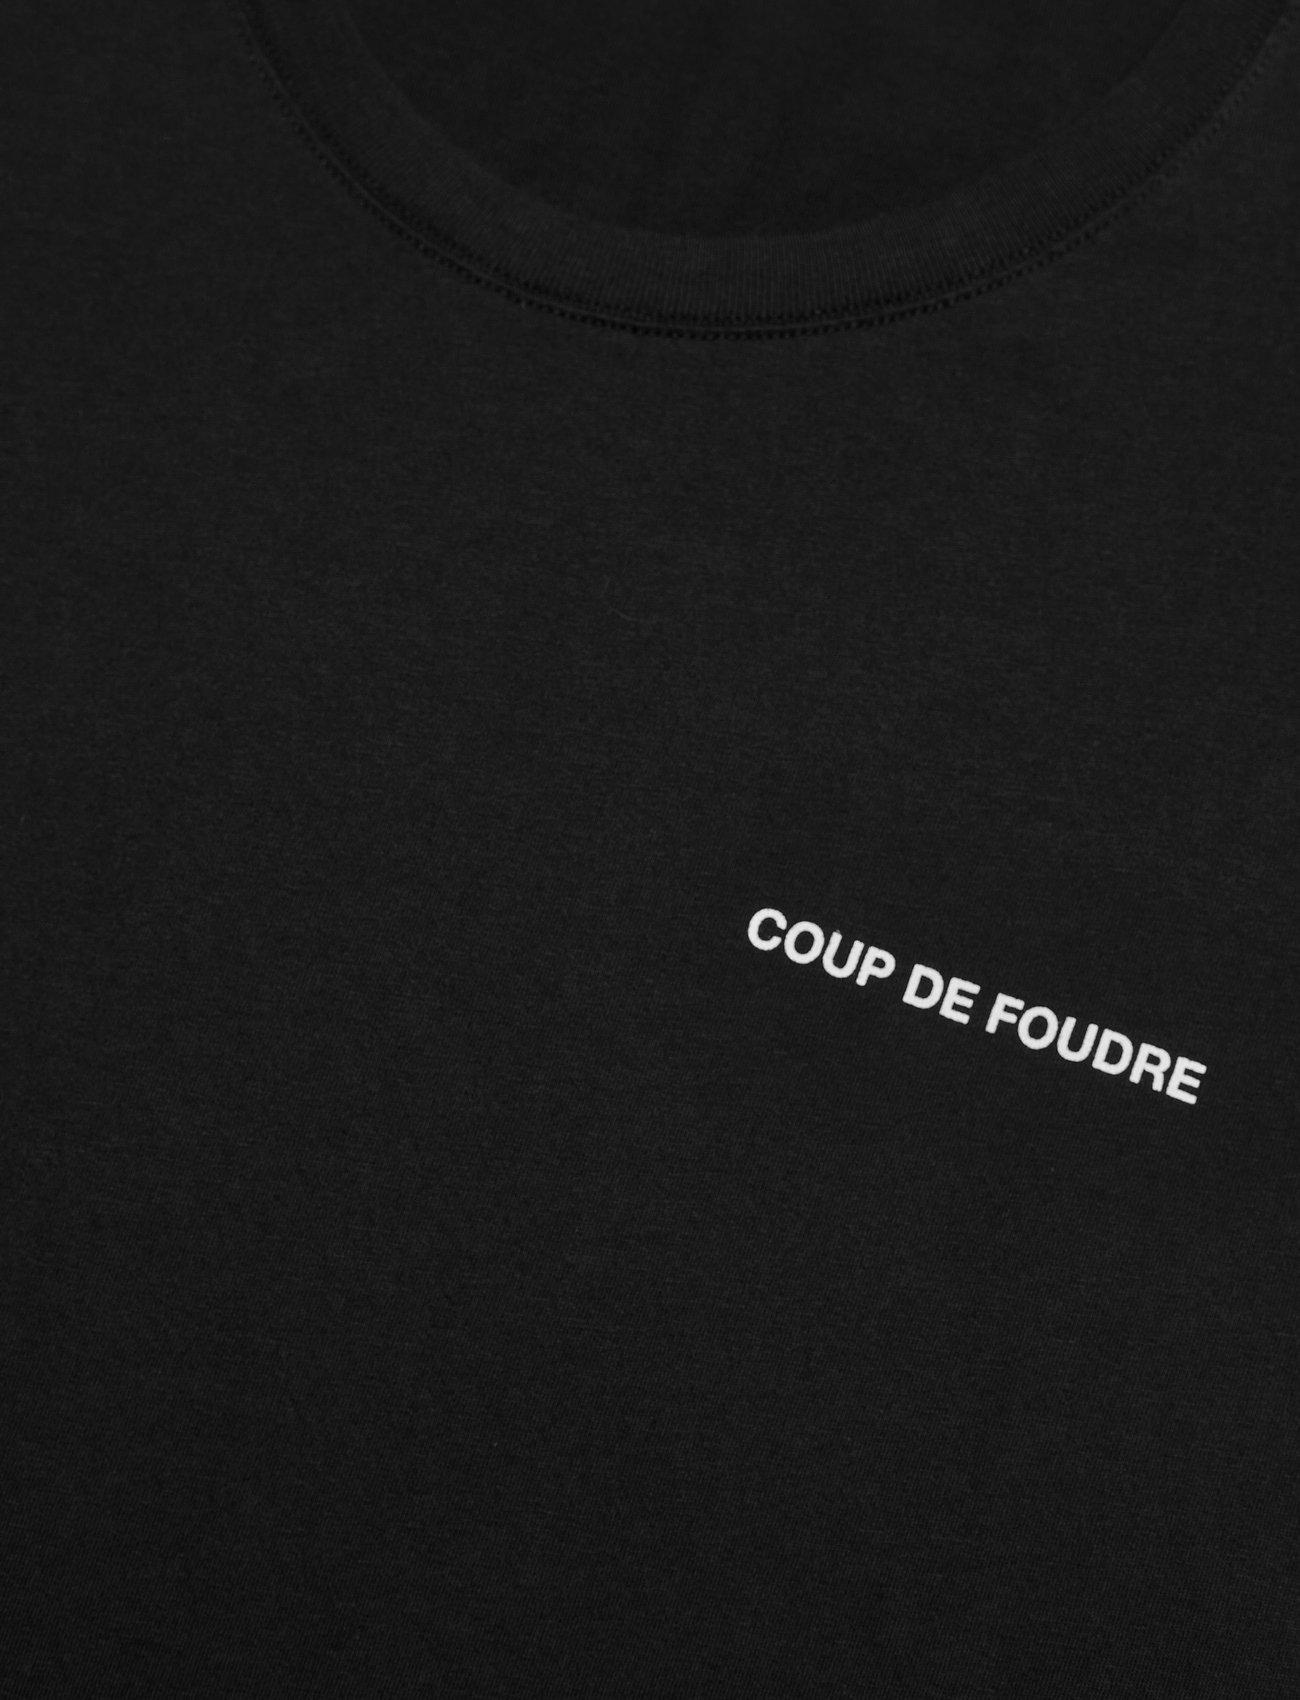 Zadig & Voltaire TED HC PHOTOPRINT CDF TSHIRT PRINT DOS - T-skjorter BLACK - Menn Klær